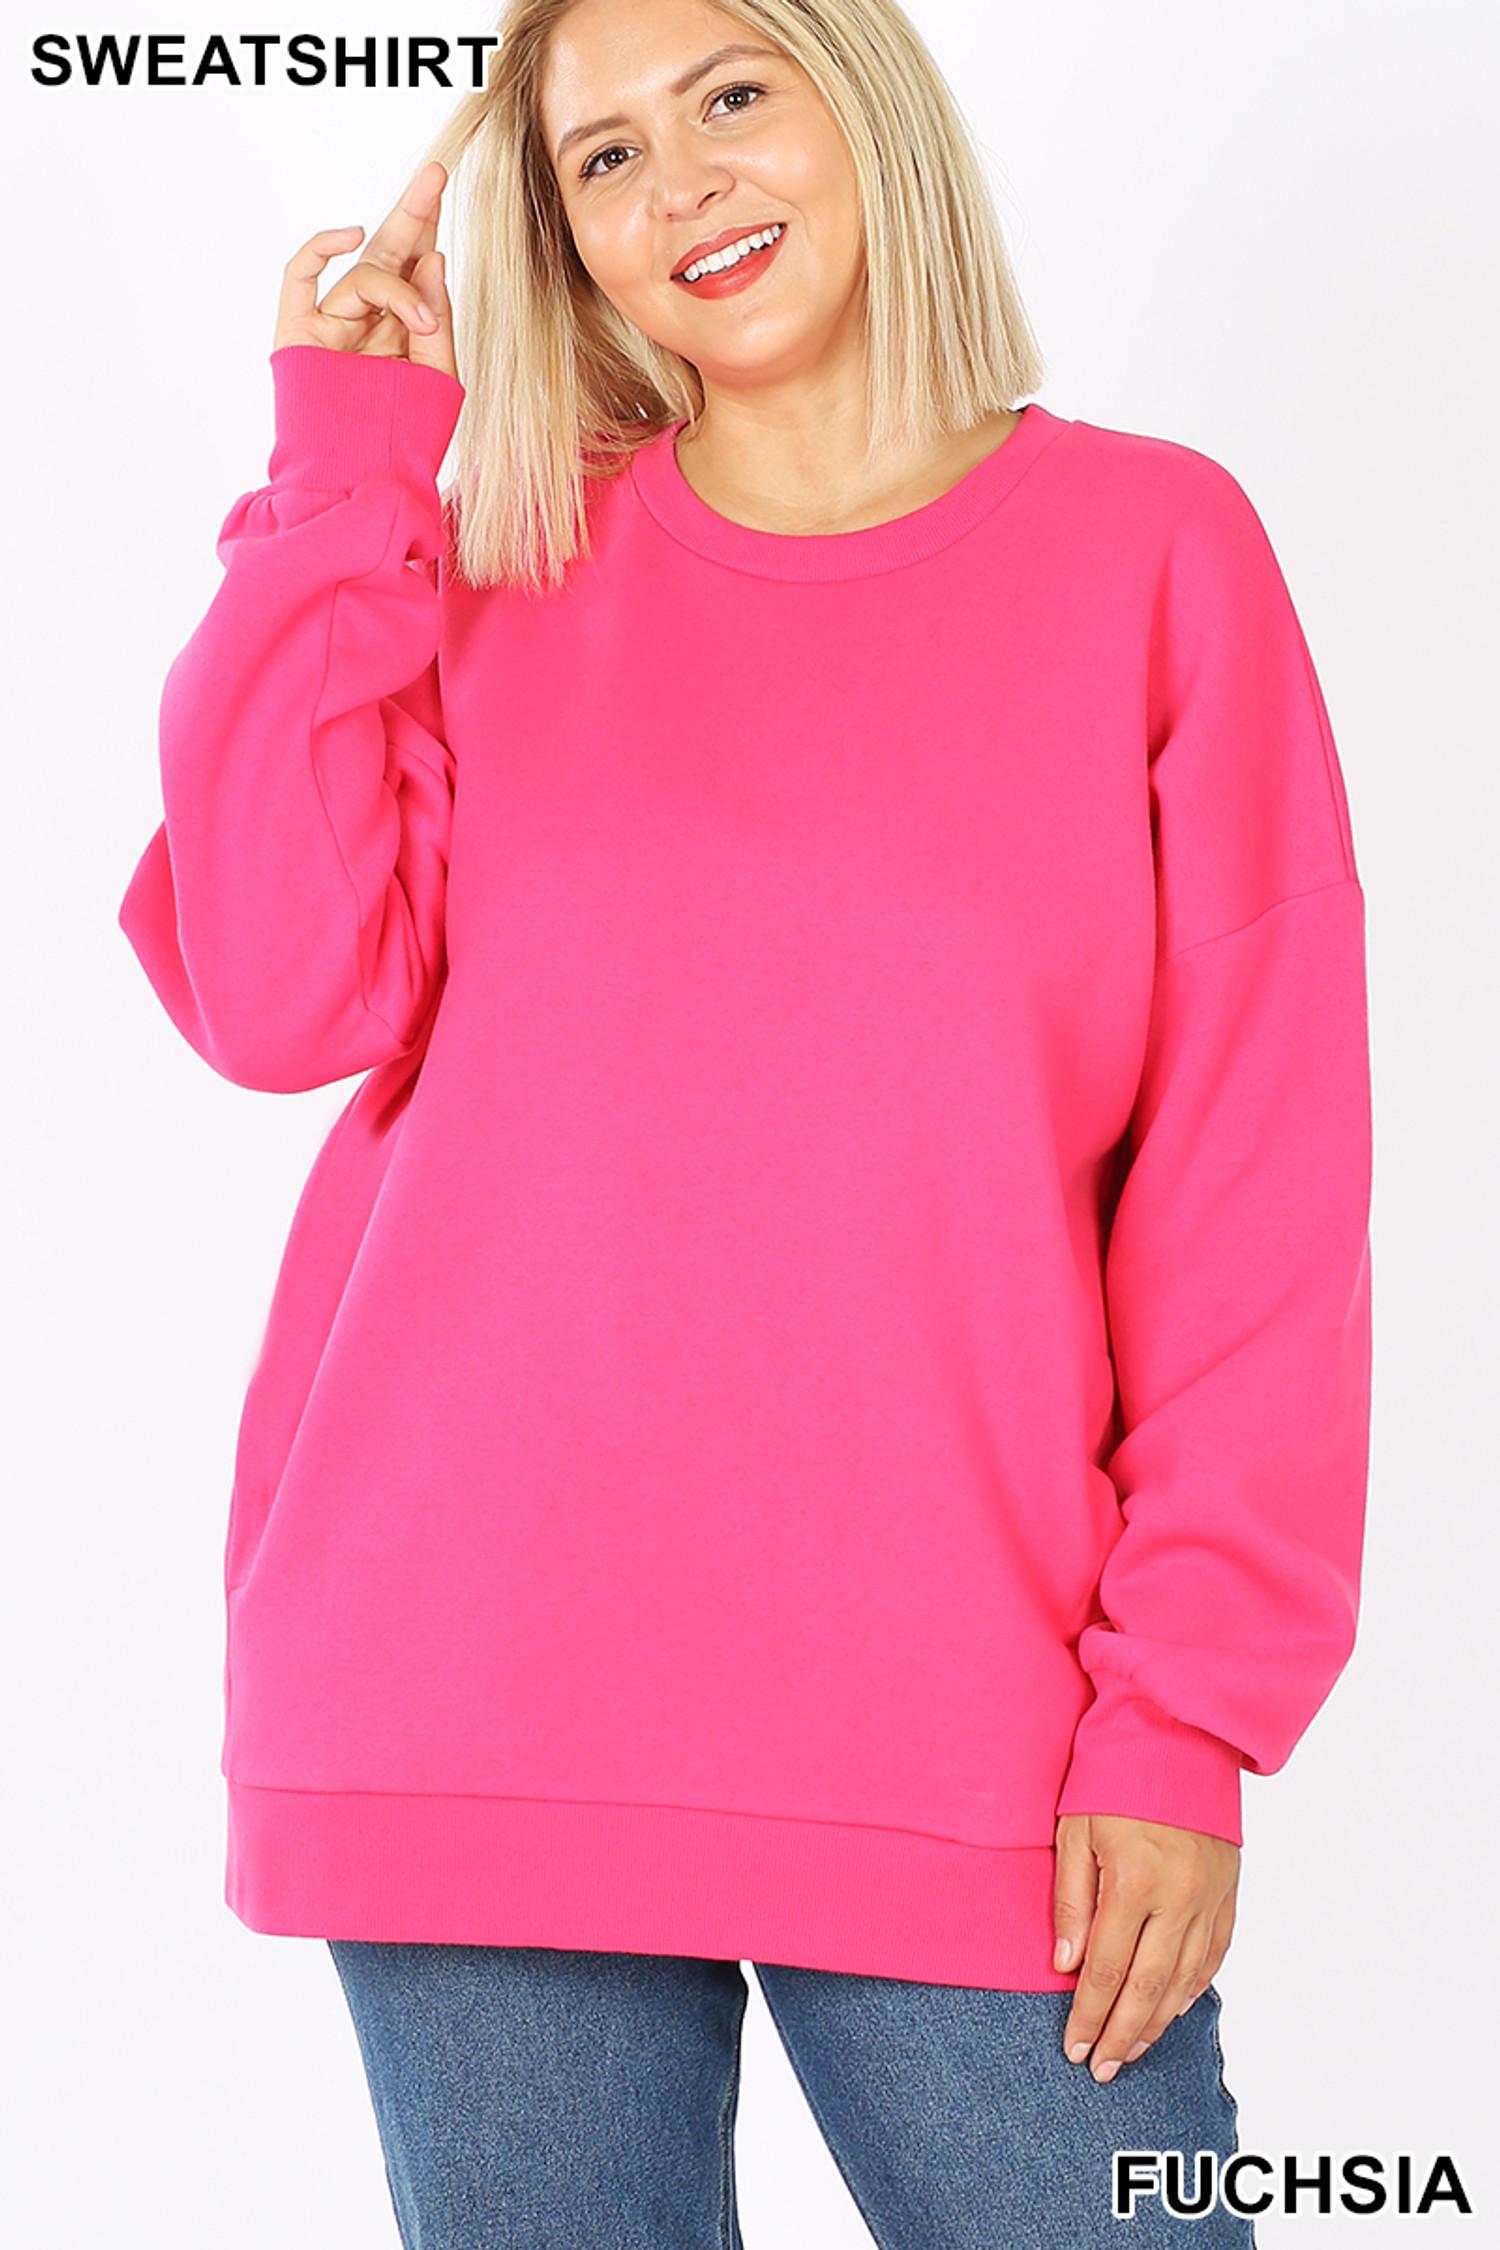 Front image of Fuchsia Cotton Round Crew Neck Plus Size Sweatshirt with Side Pockets